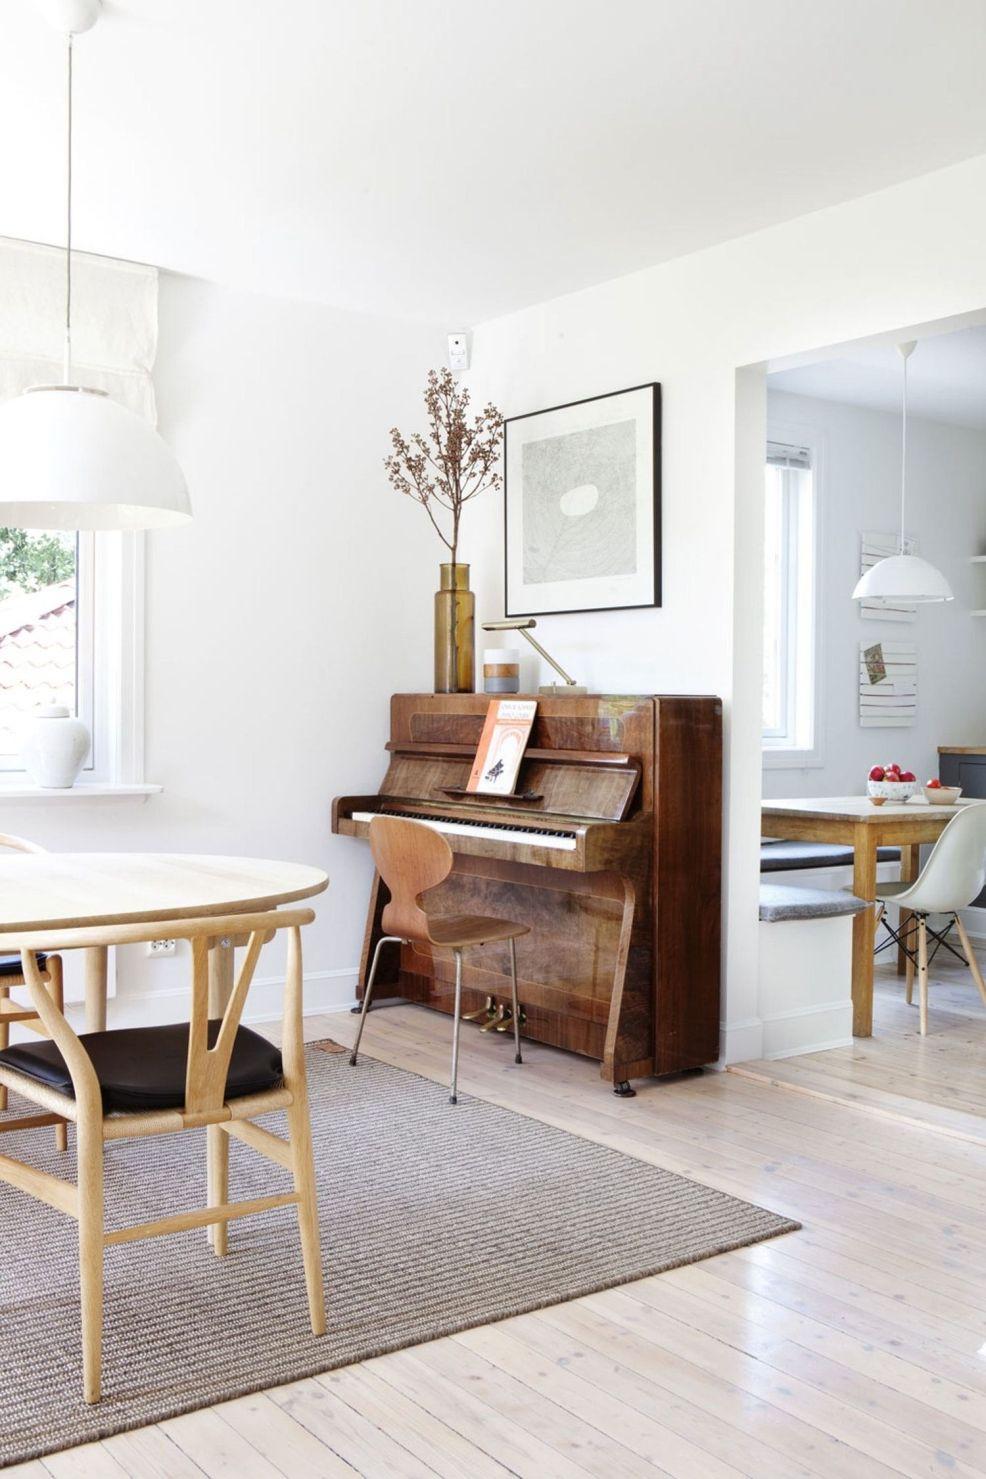 Aménager un piano dans son salon